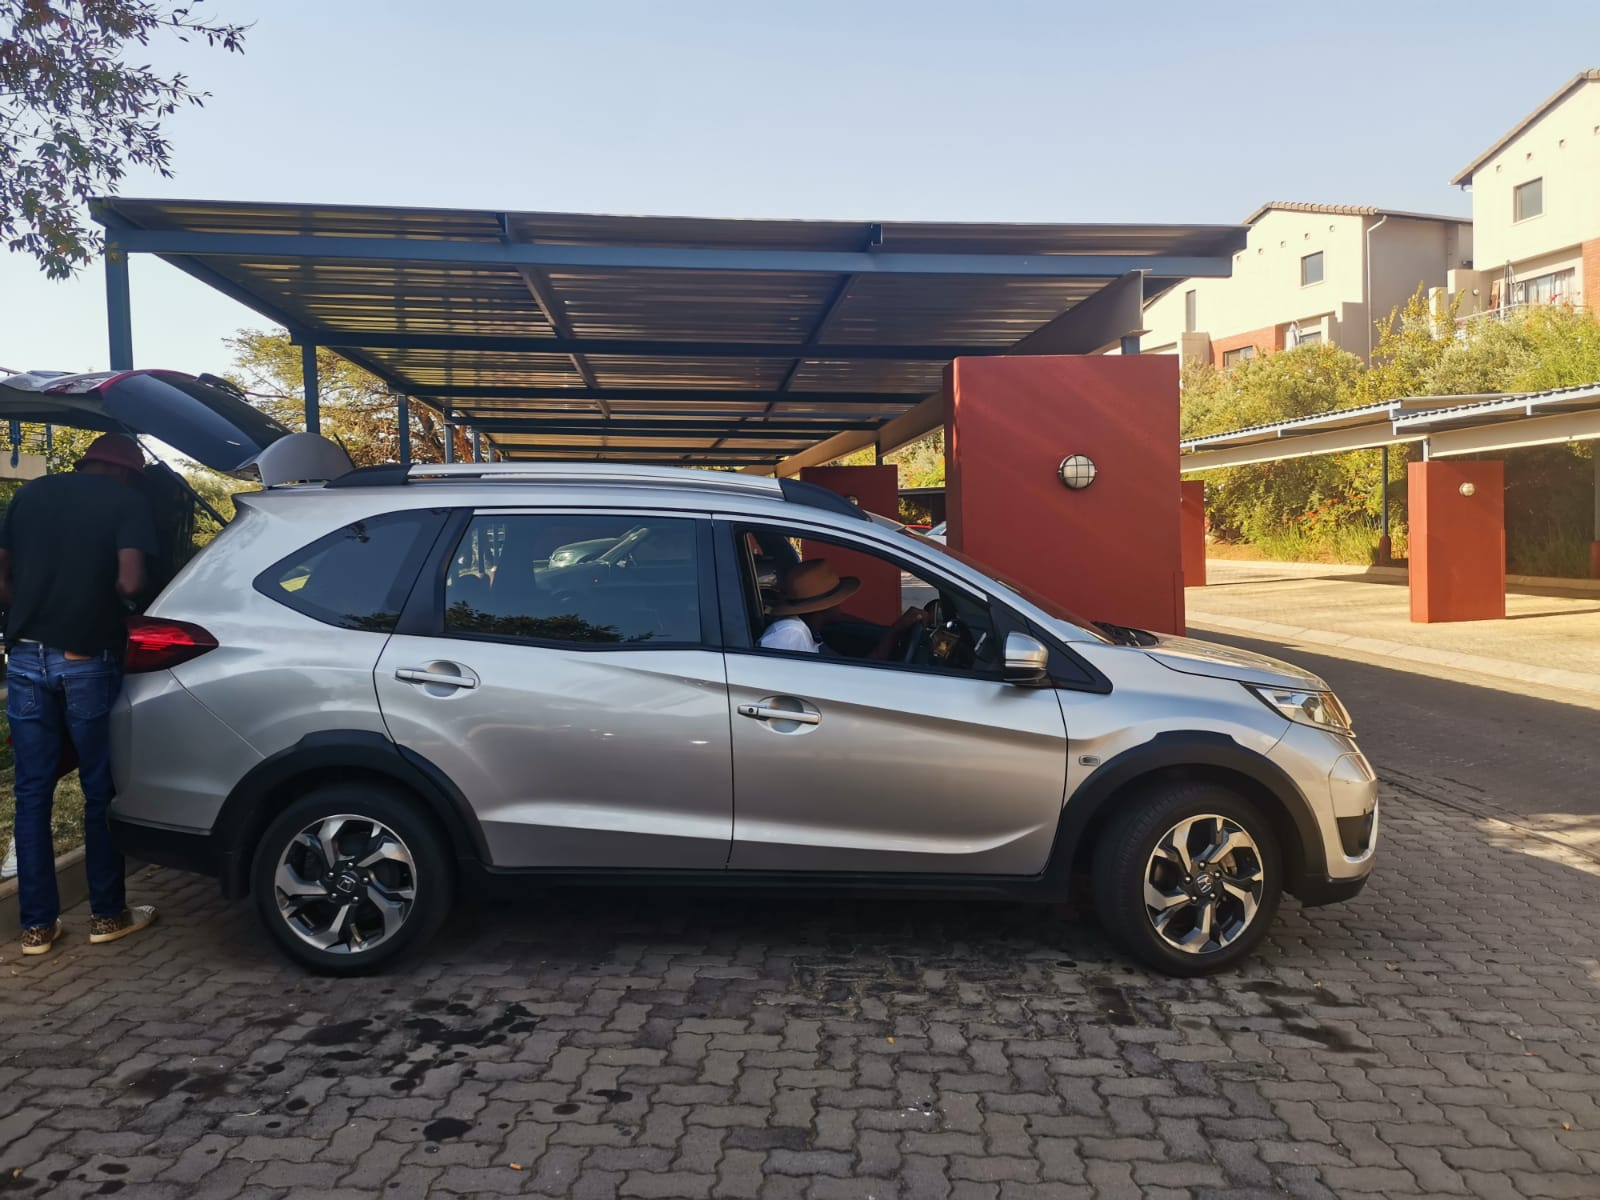 2019 Honda CRV 7 seater